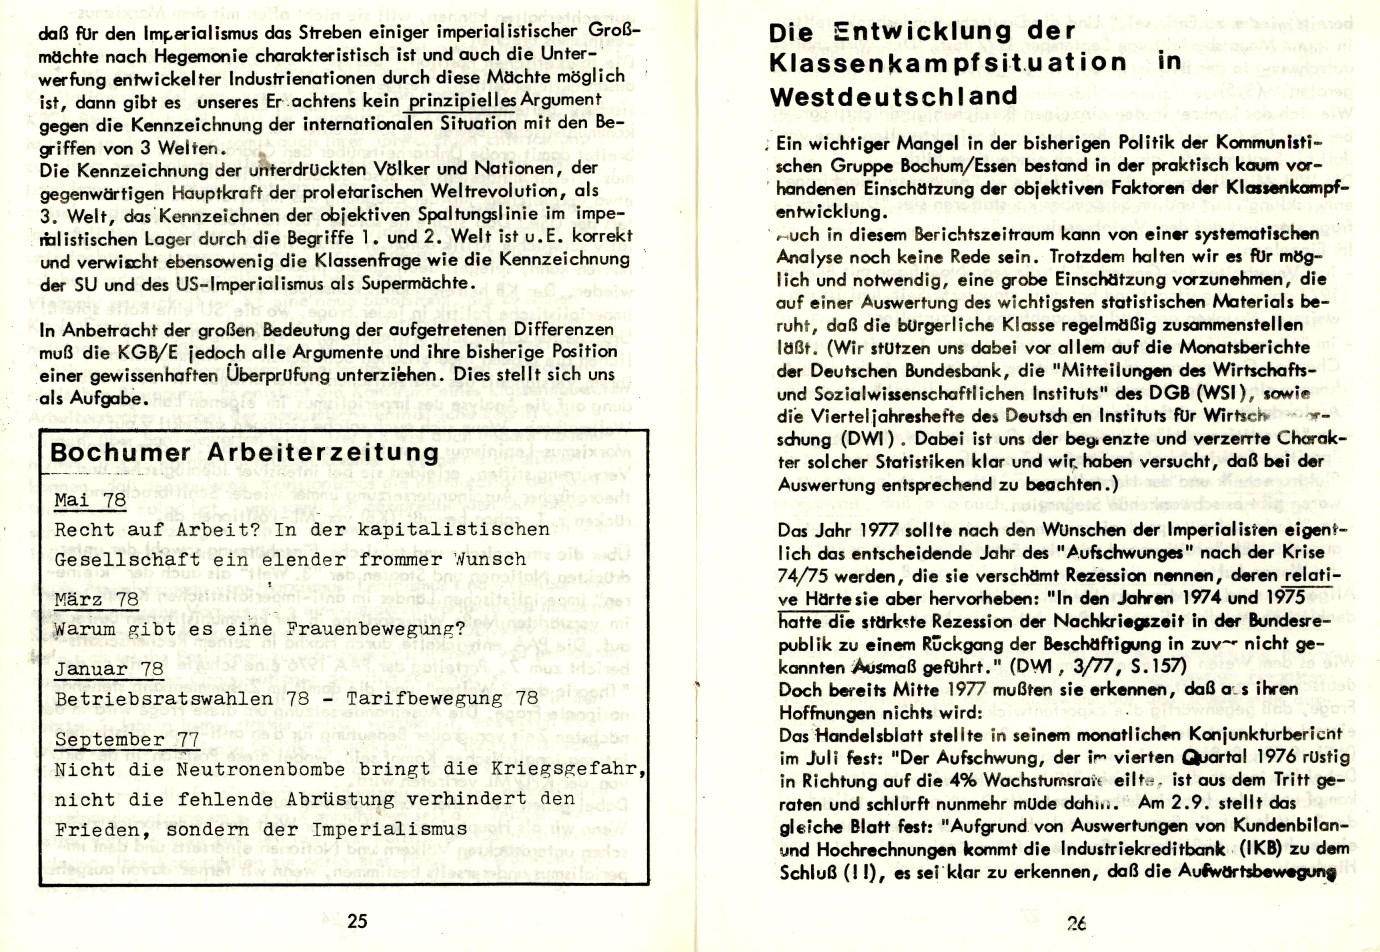 KGBE_1978_Resolutionen_14